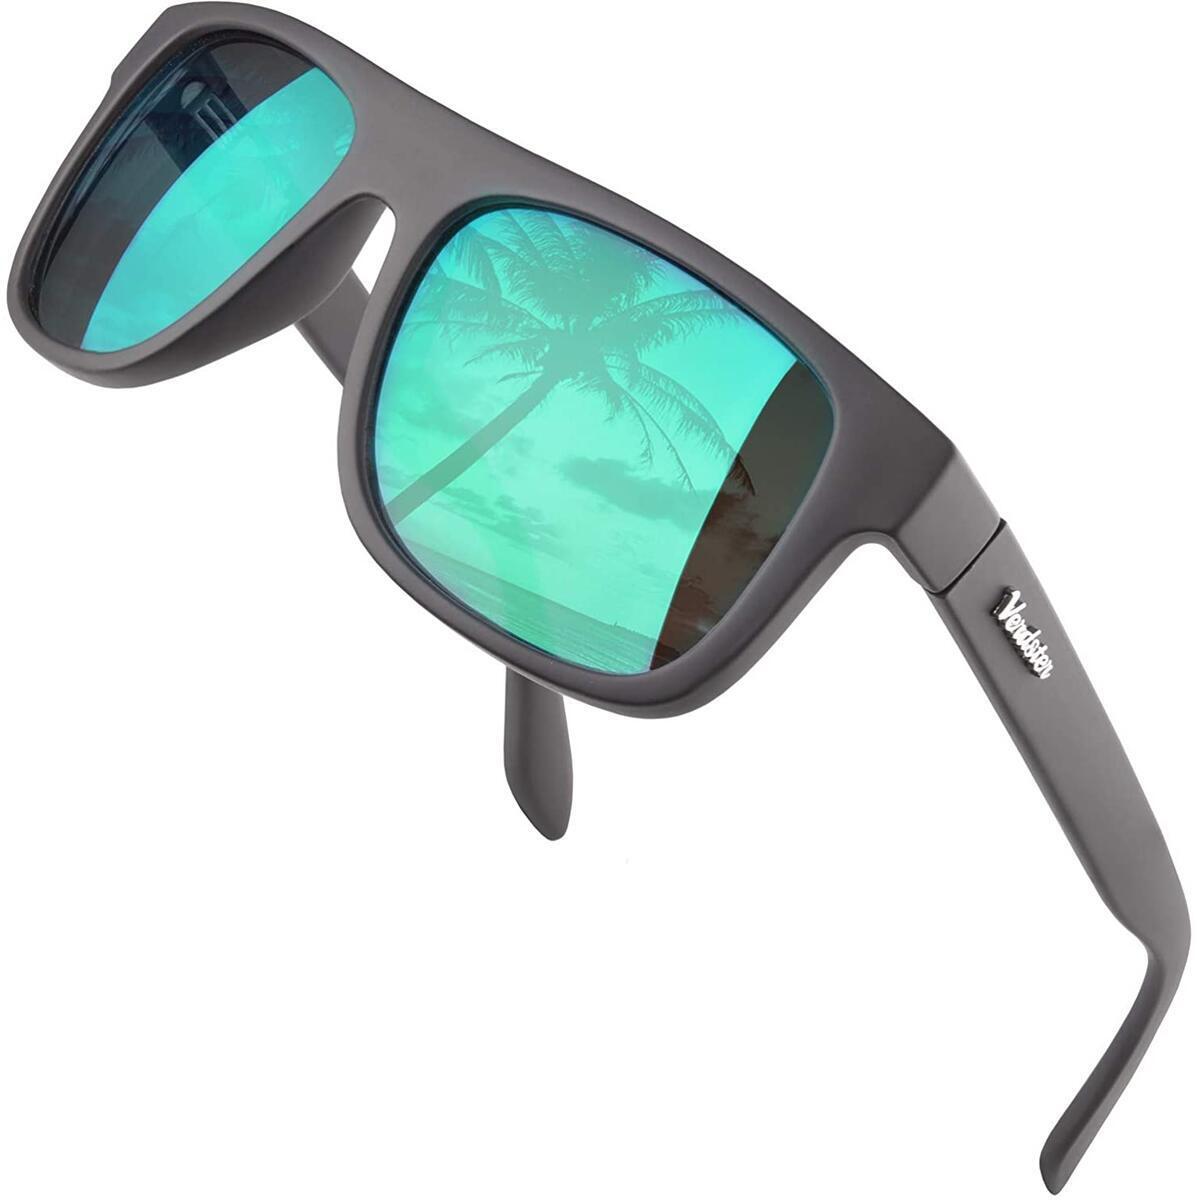 Verdster Islander 2020 Retro Square Frame - Classic Design Sunglasses for Men and Women